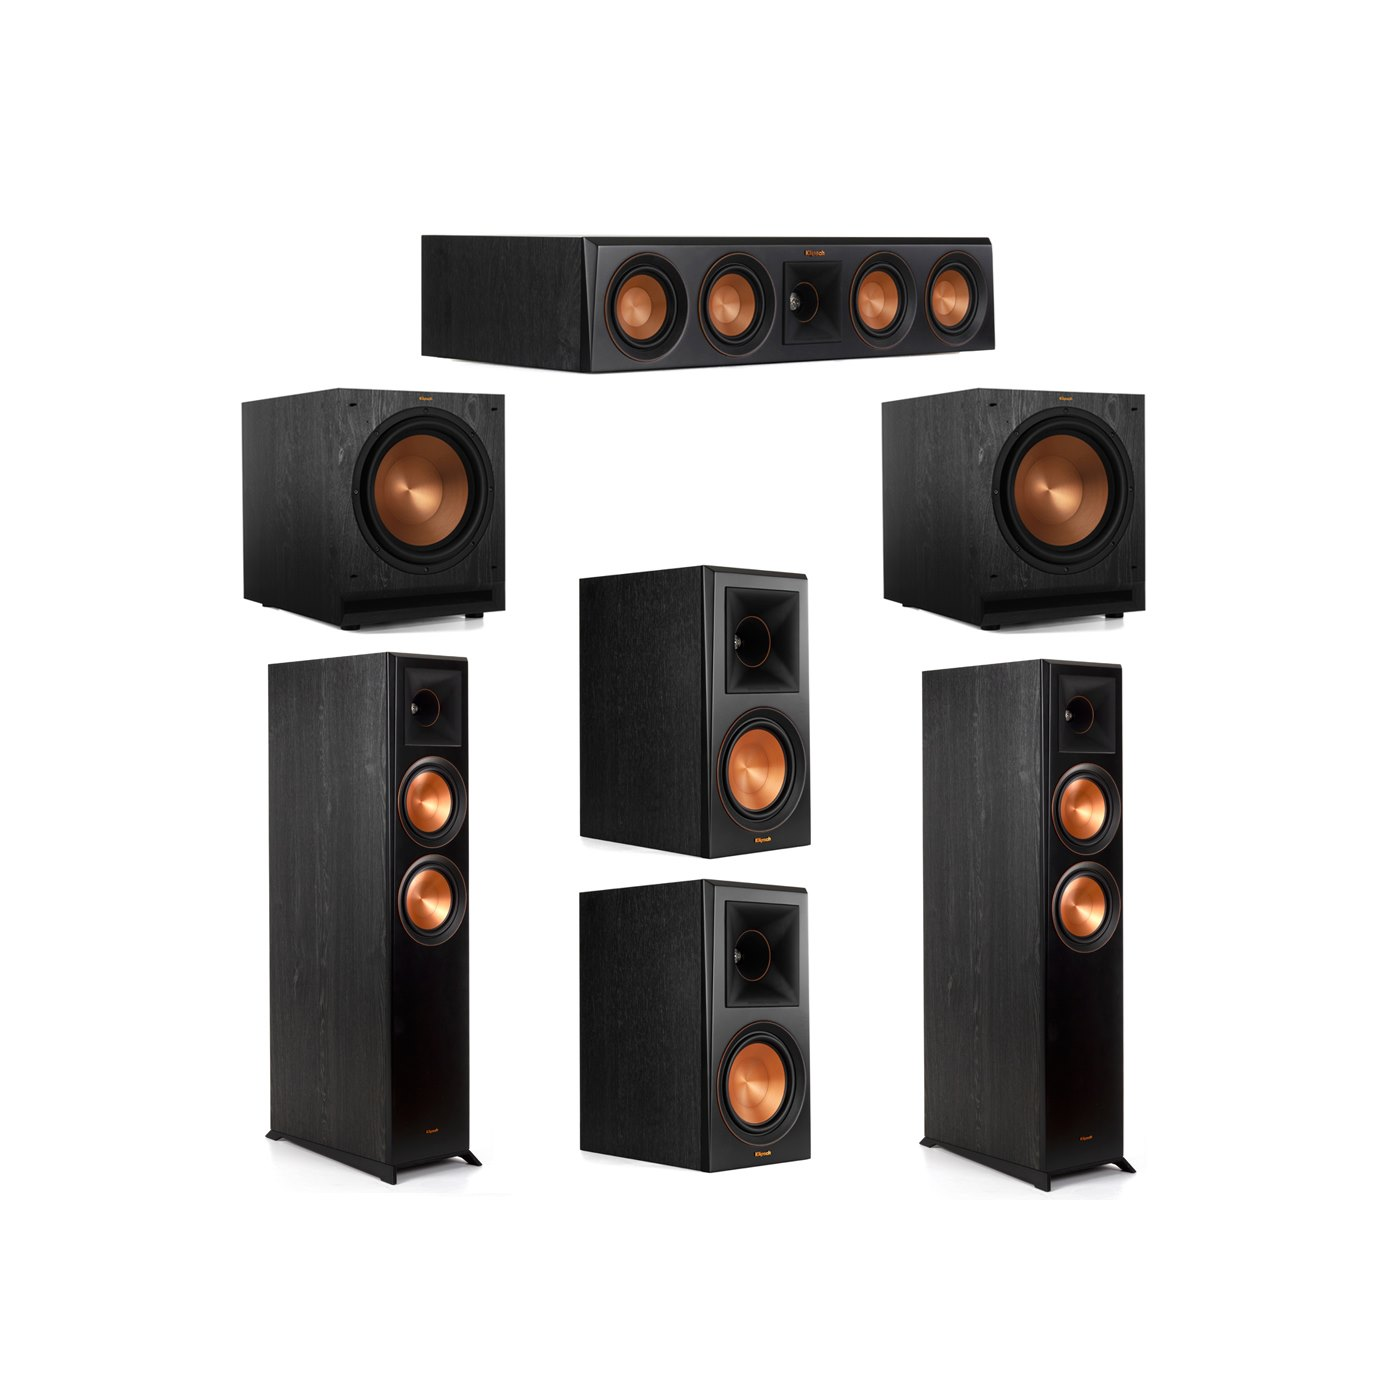 Klipsch 5.2 System with 2 RP-6000F Floorstanding Speakers, 1 Klipsch RP-404C Center Speaker, 2 Klipsch RP-600M Surround Speakers, 2 Klipsch SPL-120 Subwoofers